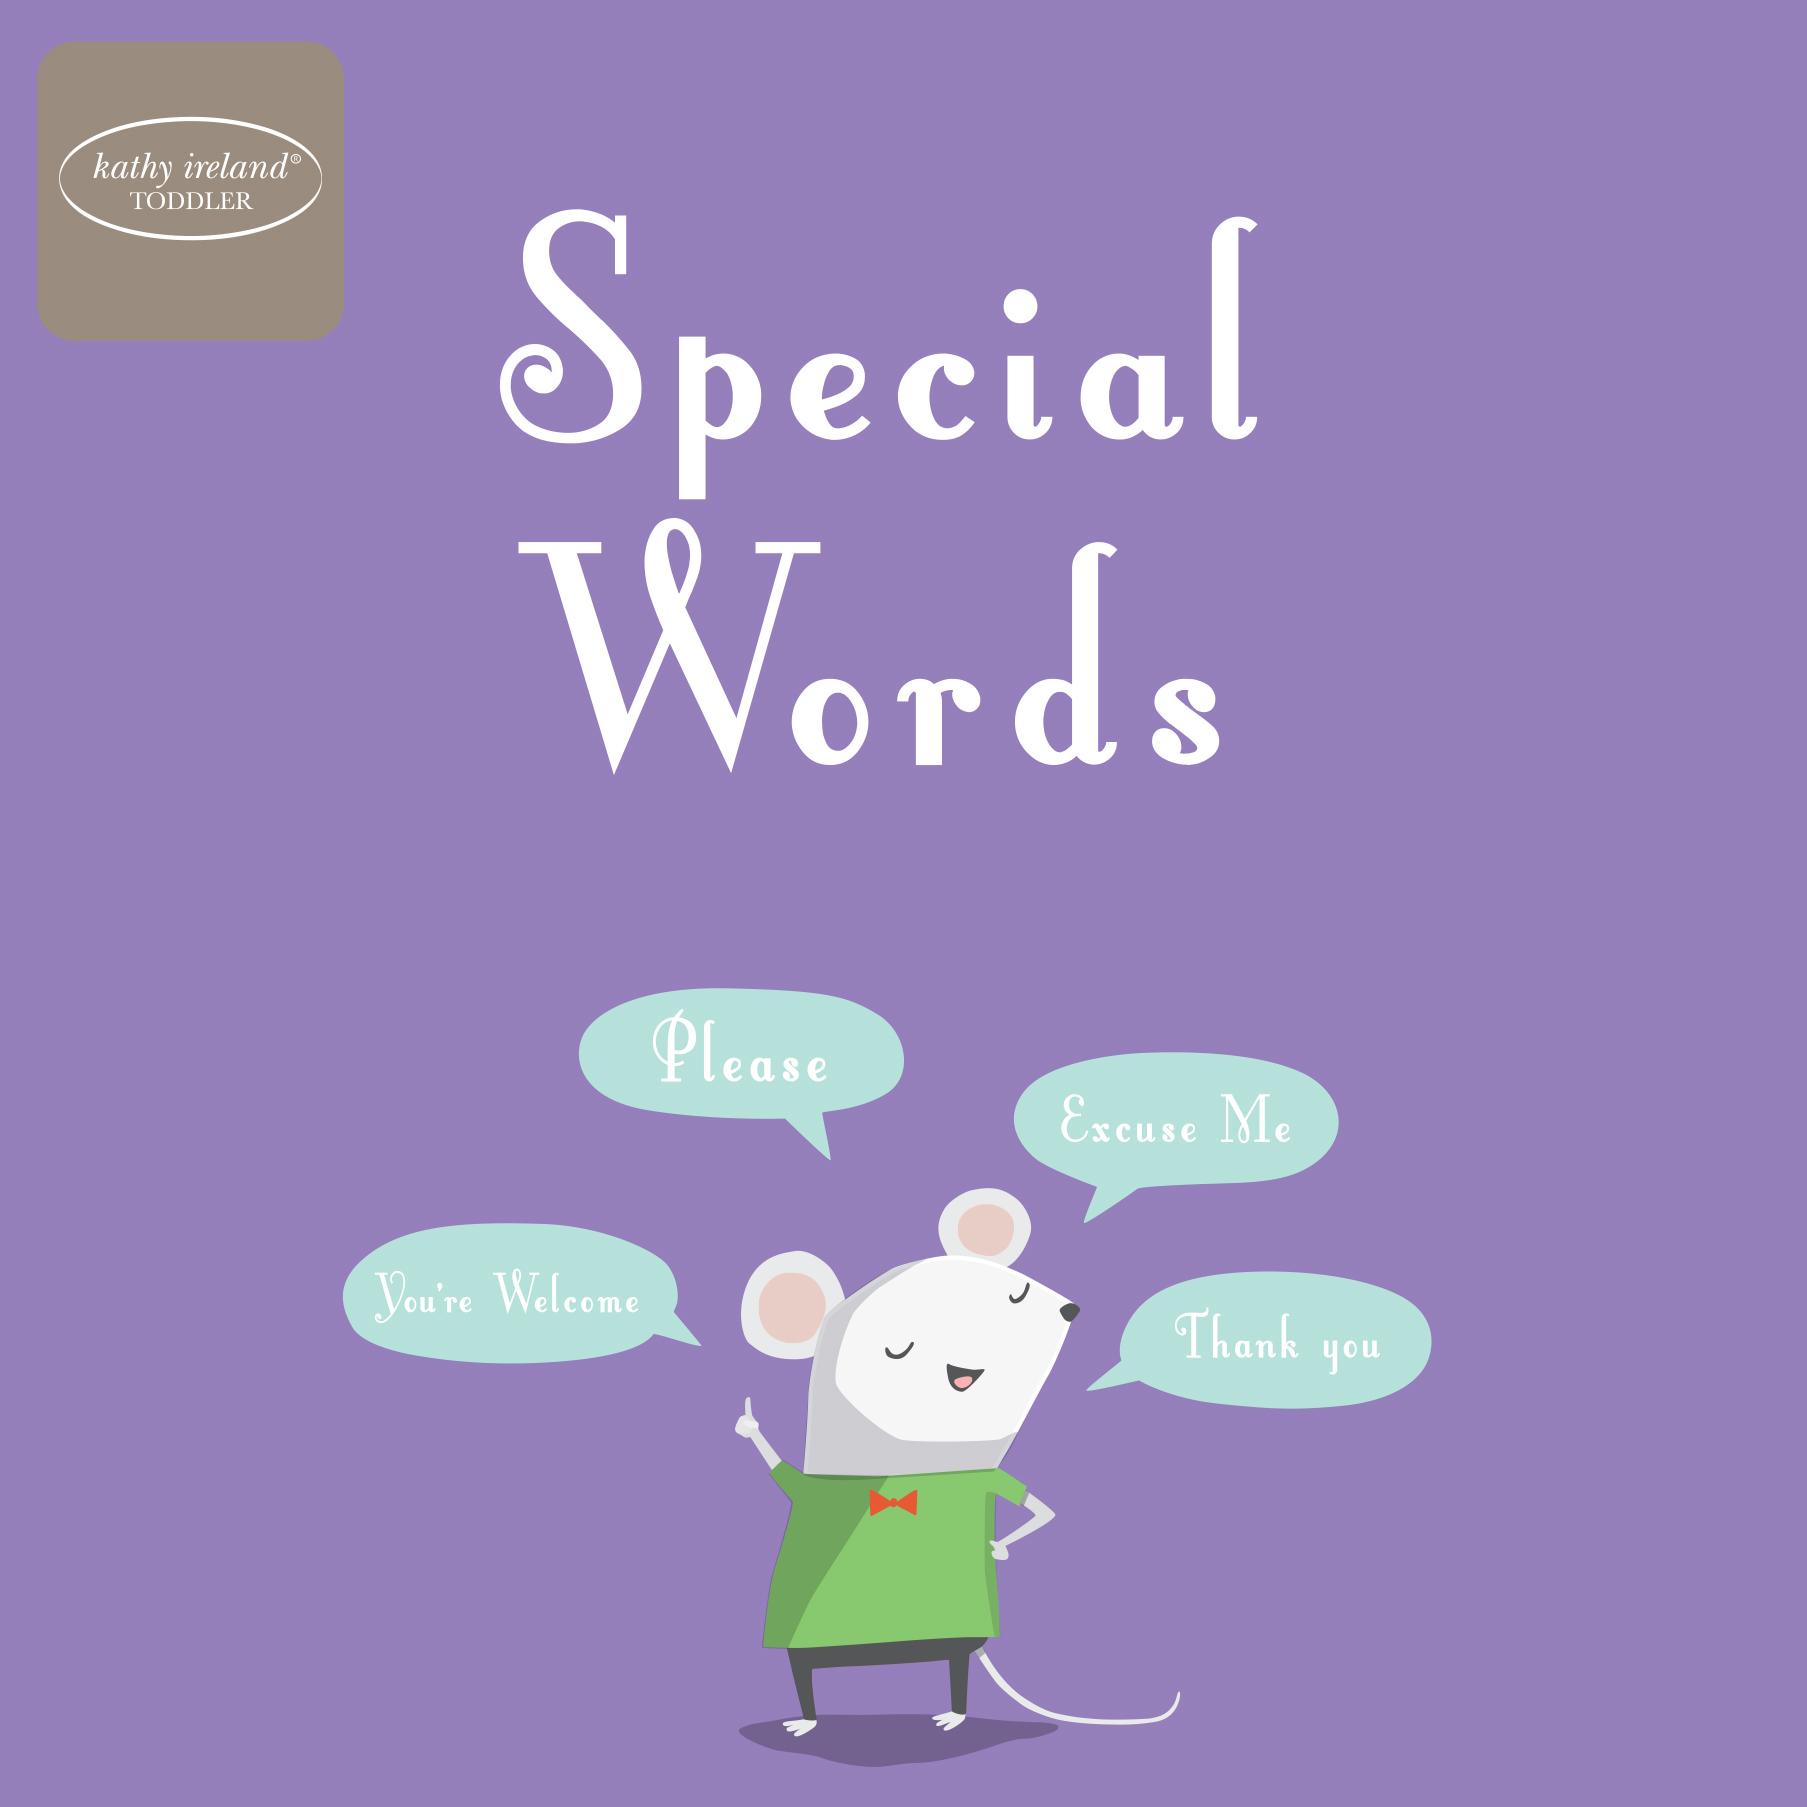 Special Words